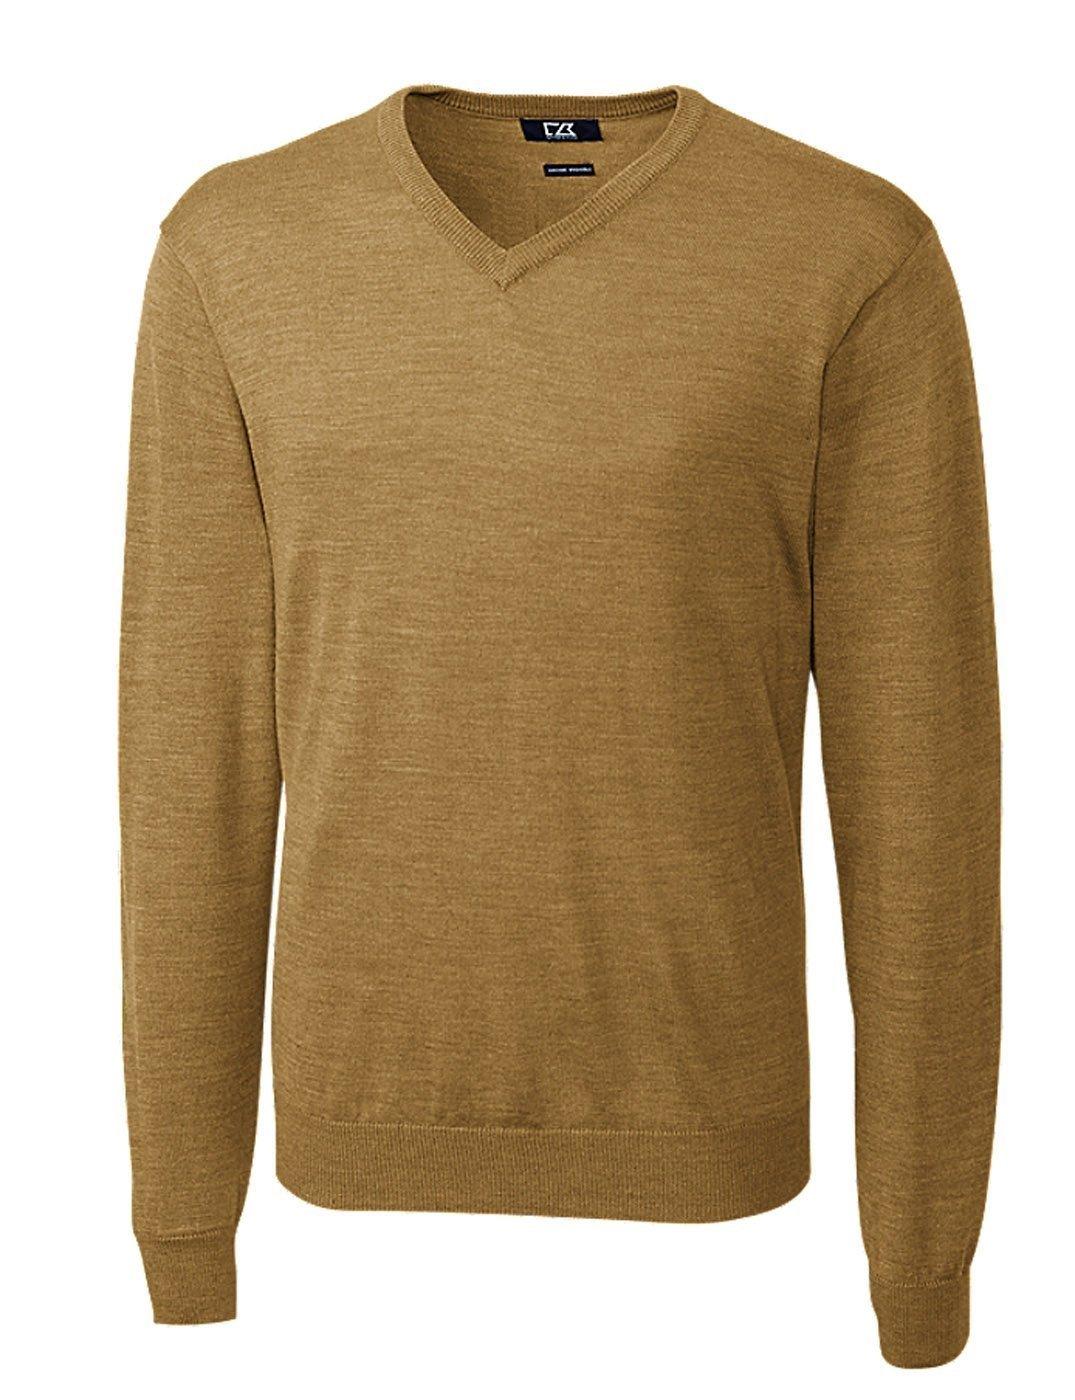 Cutter & Buck Men's Big-Tall Douglas V-Neck Sweater, Domino, 2X/Tall